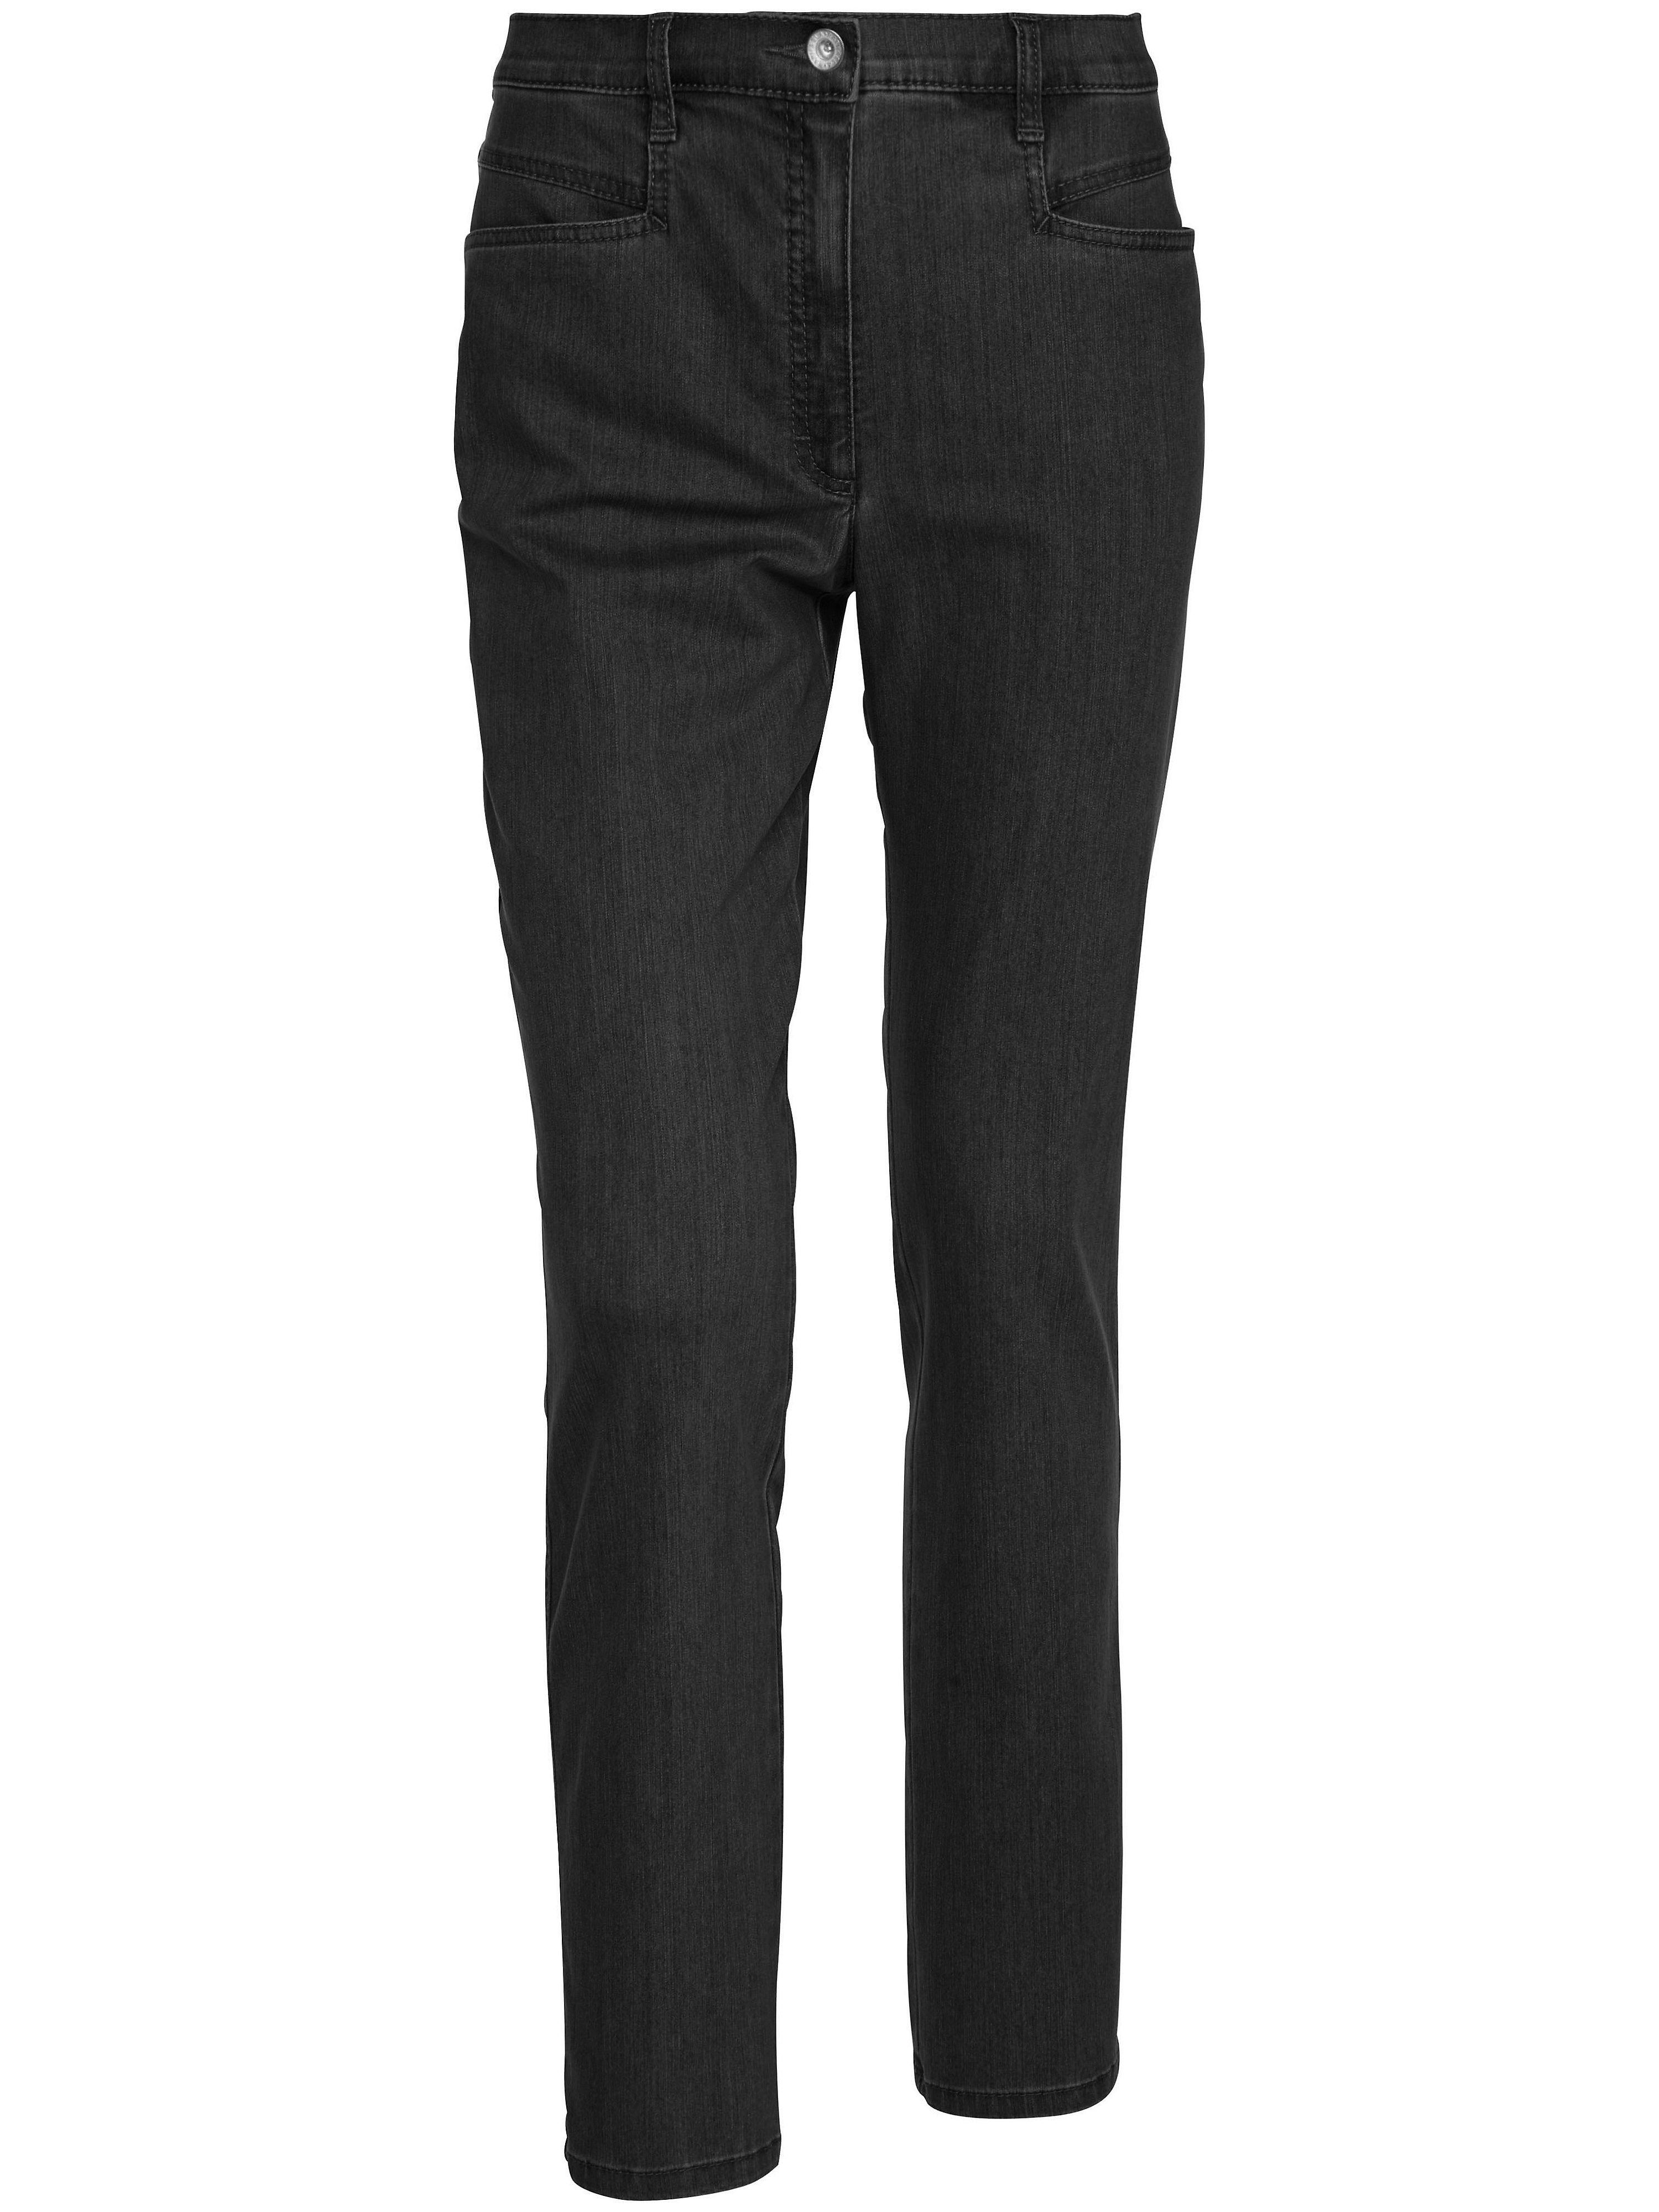 Damen Raphaela by Brax Jeans Modell CORDULA ComfortPlus  denim | 04044815463298